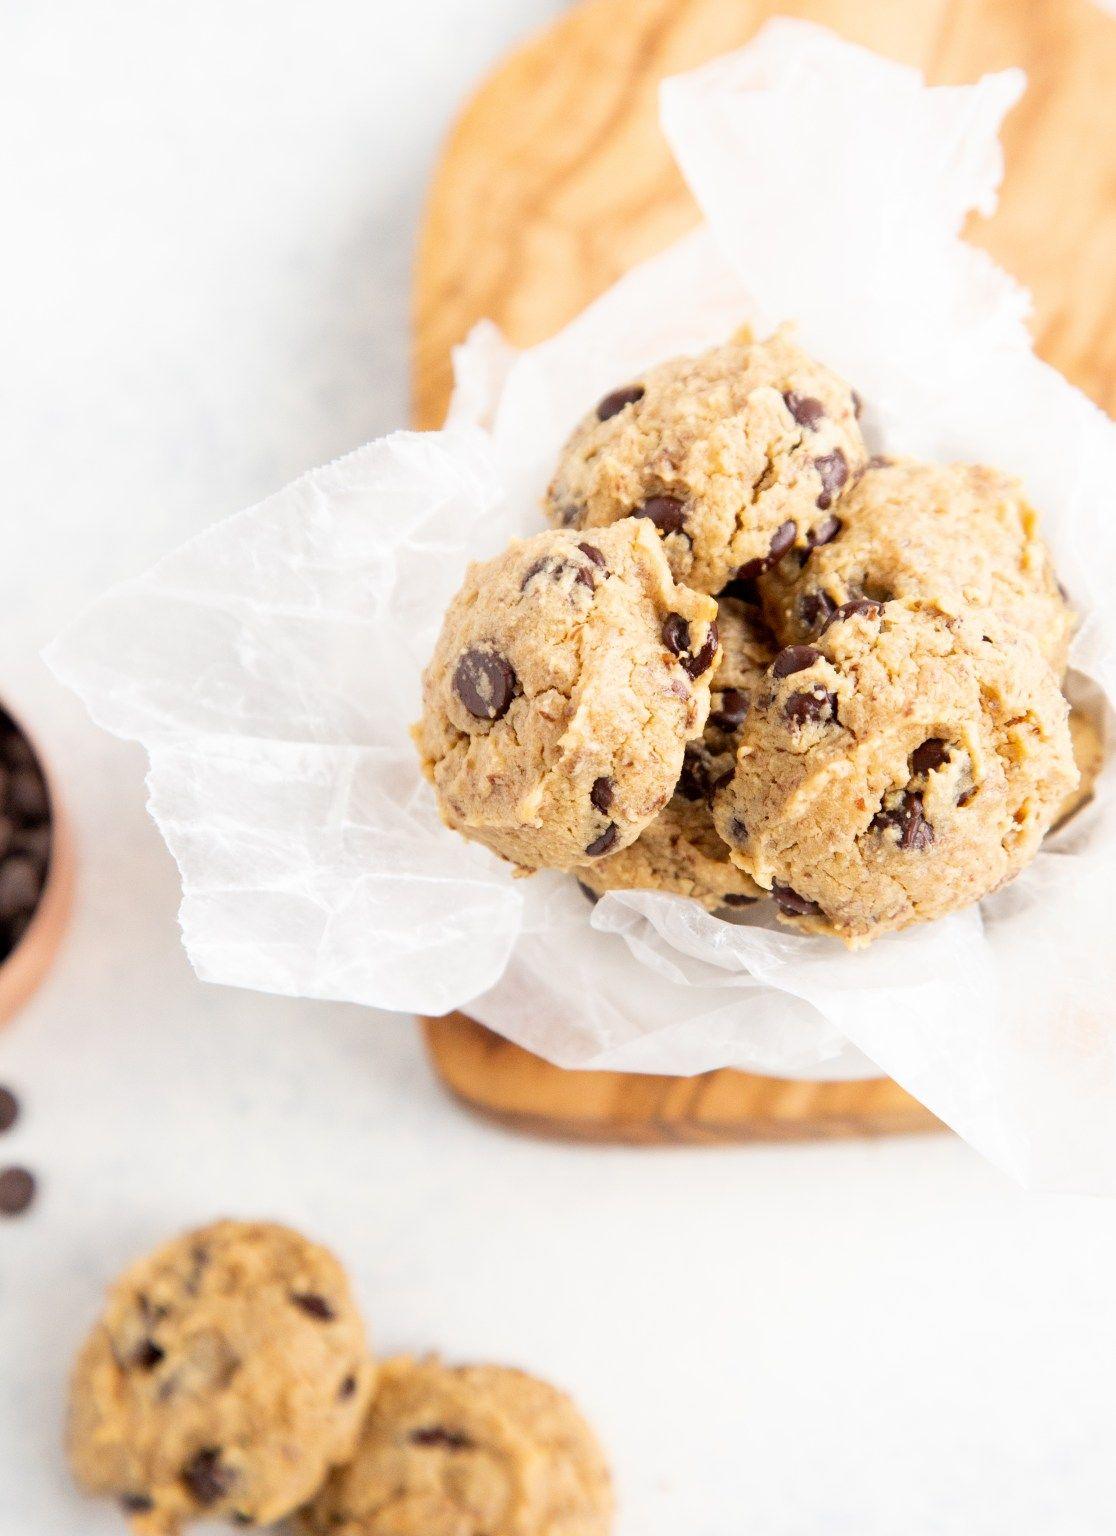 Sugar Free Gf Vegan Chocolate Chip Cookies Paige Bakes Recipe In 2020 Vegan Chocolate Chip Cookies Sugar Free Cookies Vegan Chocolate